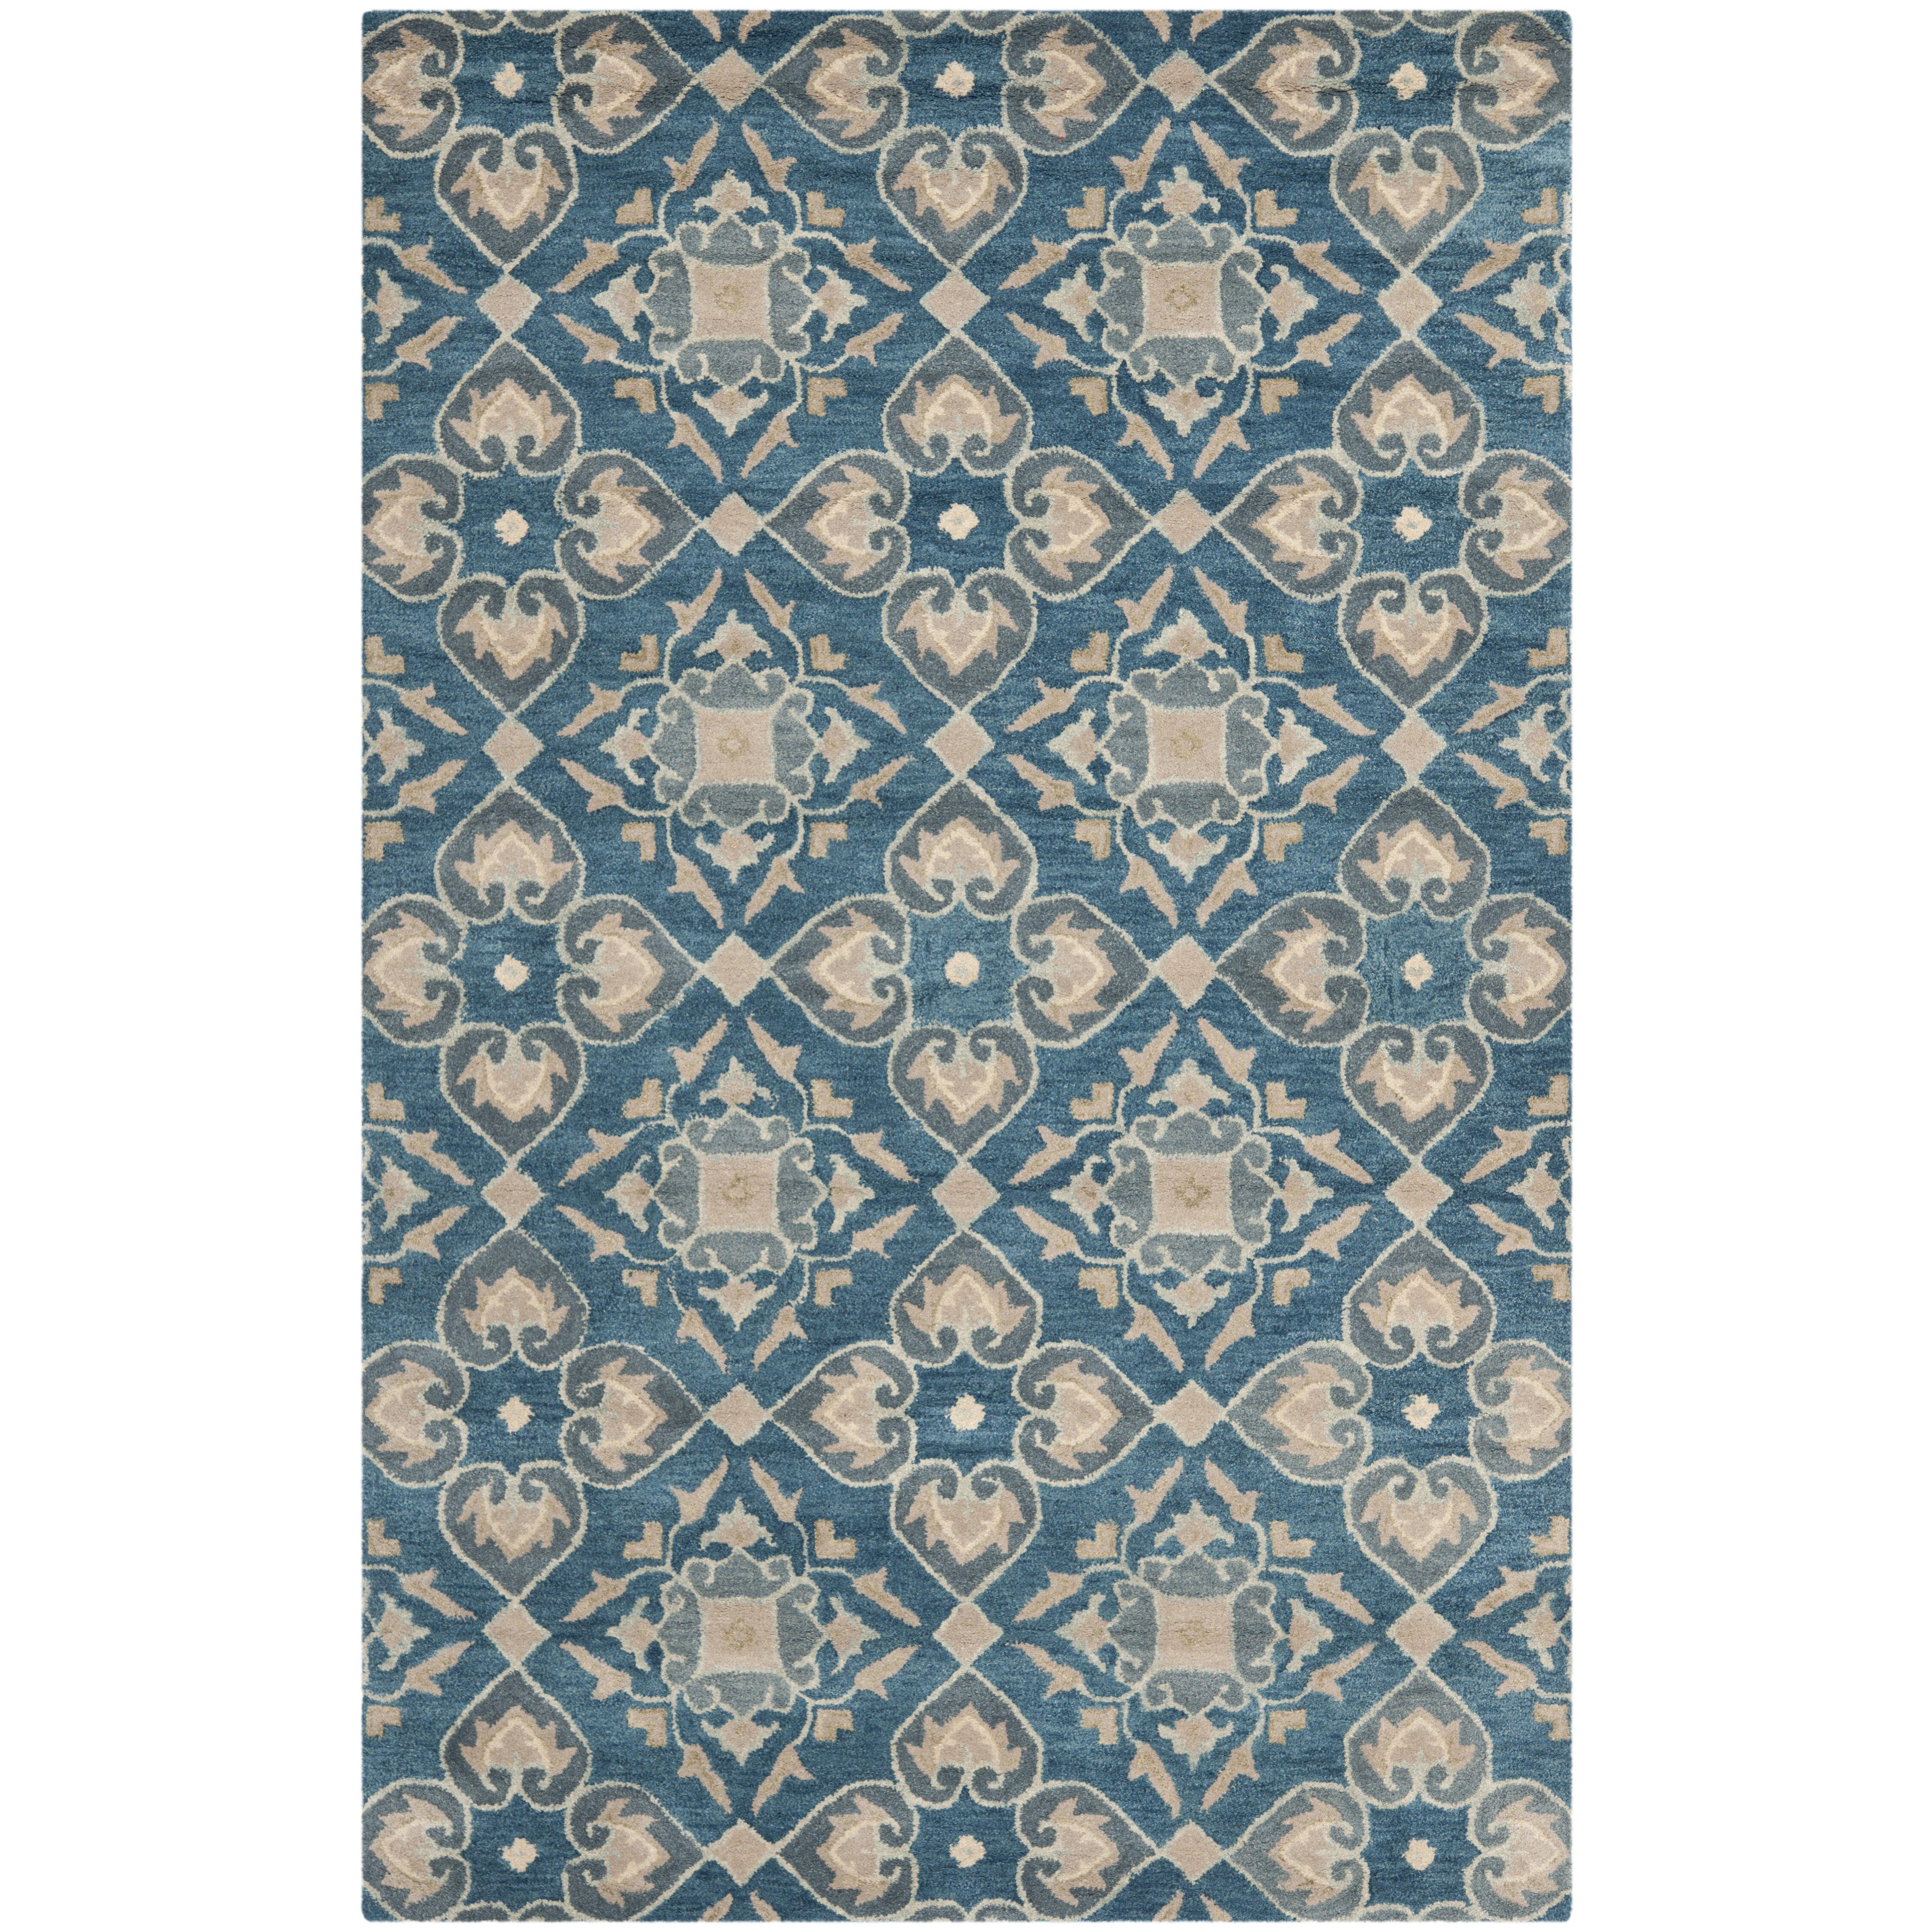 safavieh wyndham blue grey area rug reviews wayfair. Black Bedroom Furniture Sets. Home Design Ideas